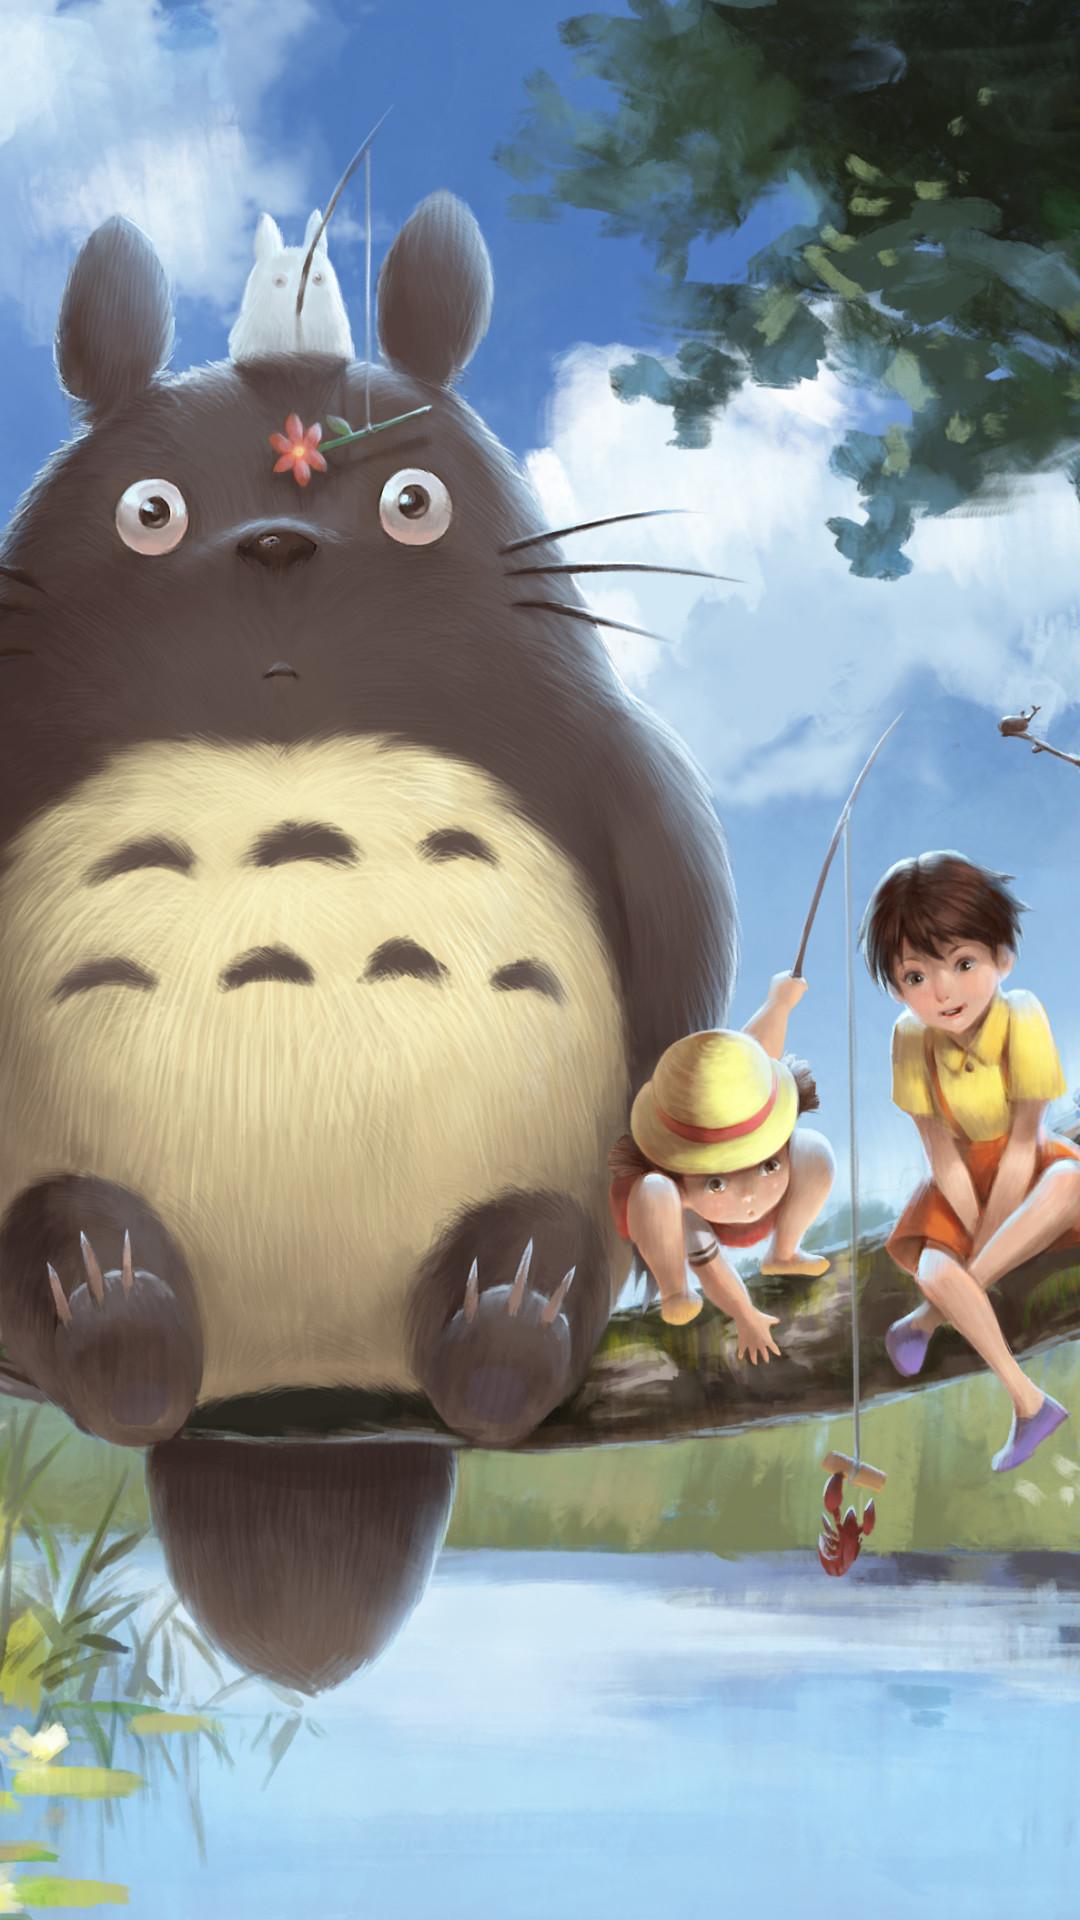 Cute Totoro Wallpaper My Neighbor Totoro Wallpaper 64 Pictures